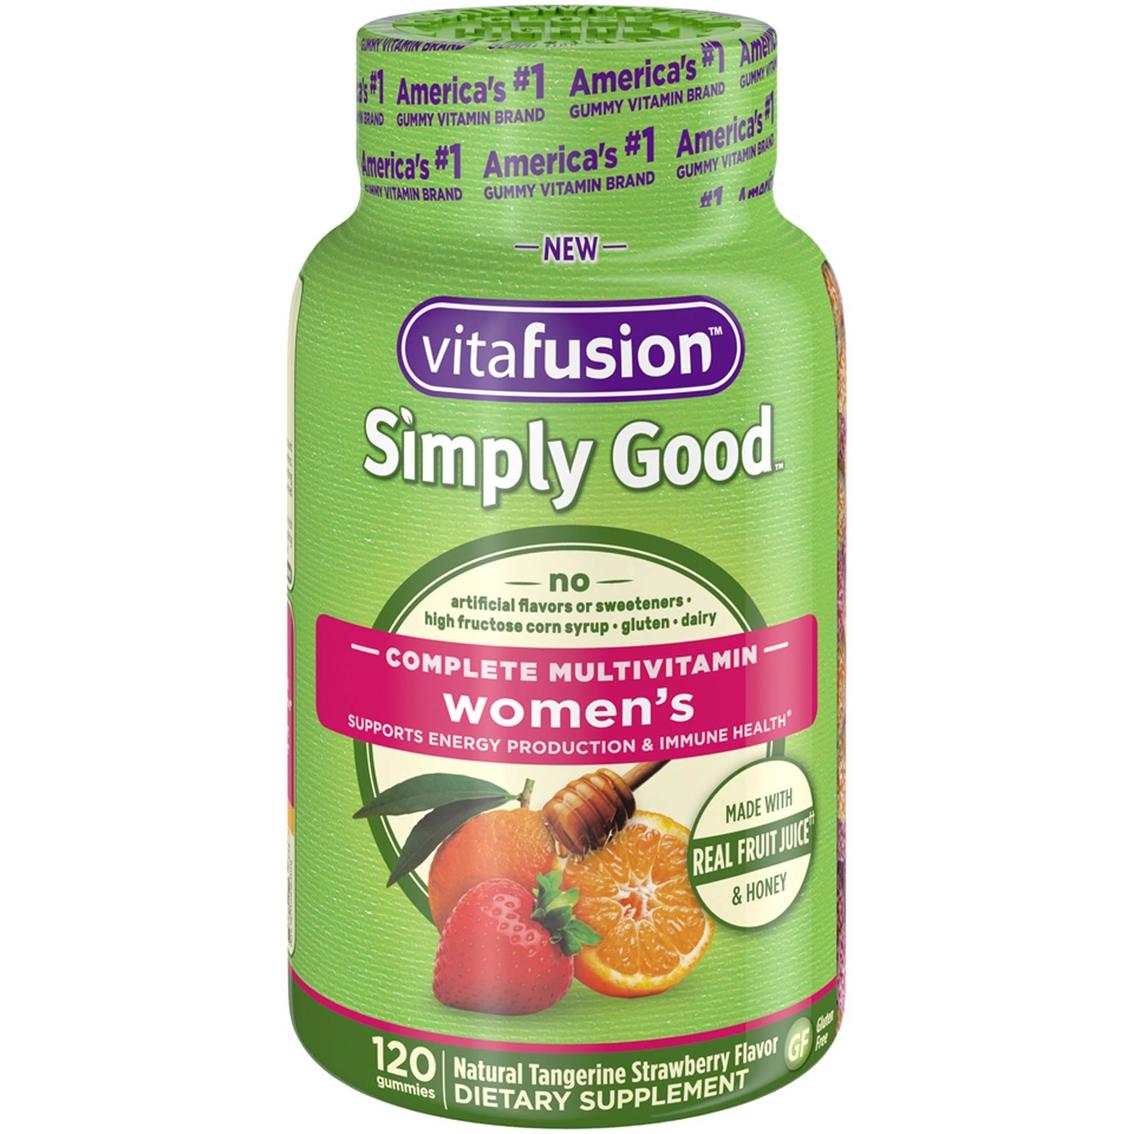 Best Womens Multivitamin 2020.Vitafusion Simply Good Women S Complete Multivitamin 120 Pk